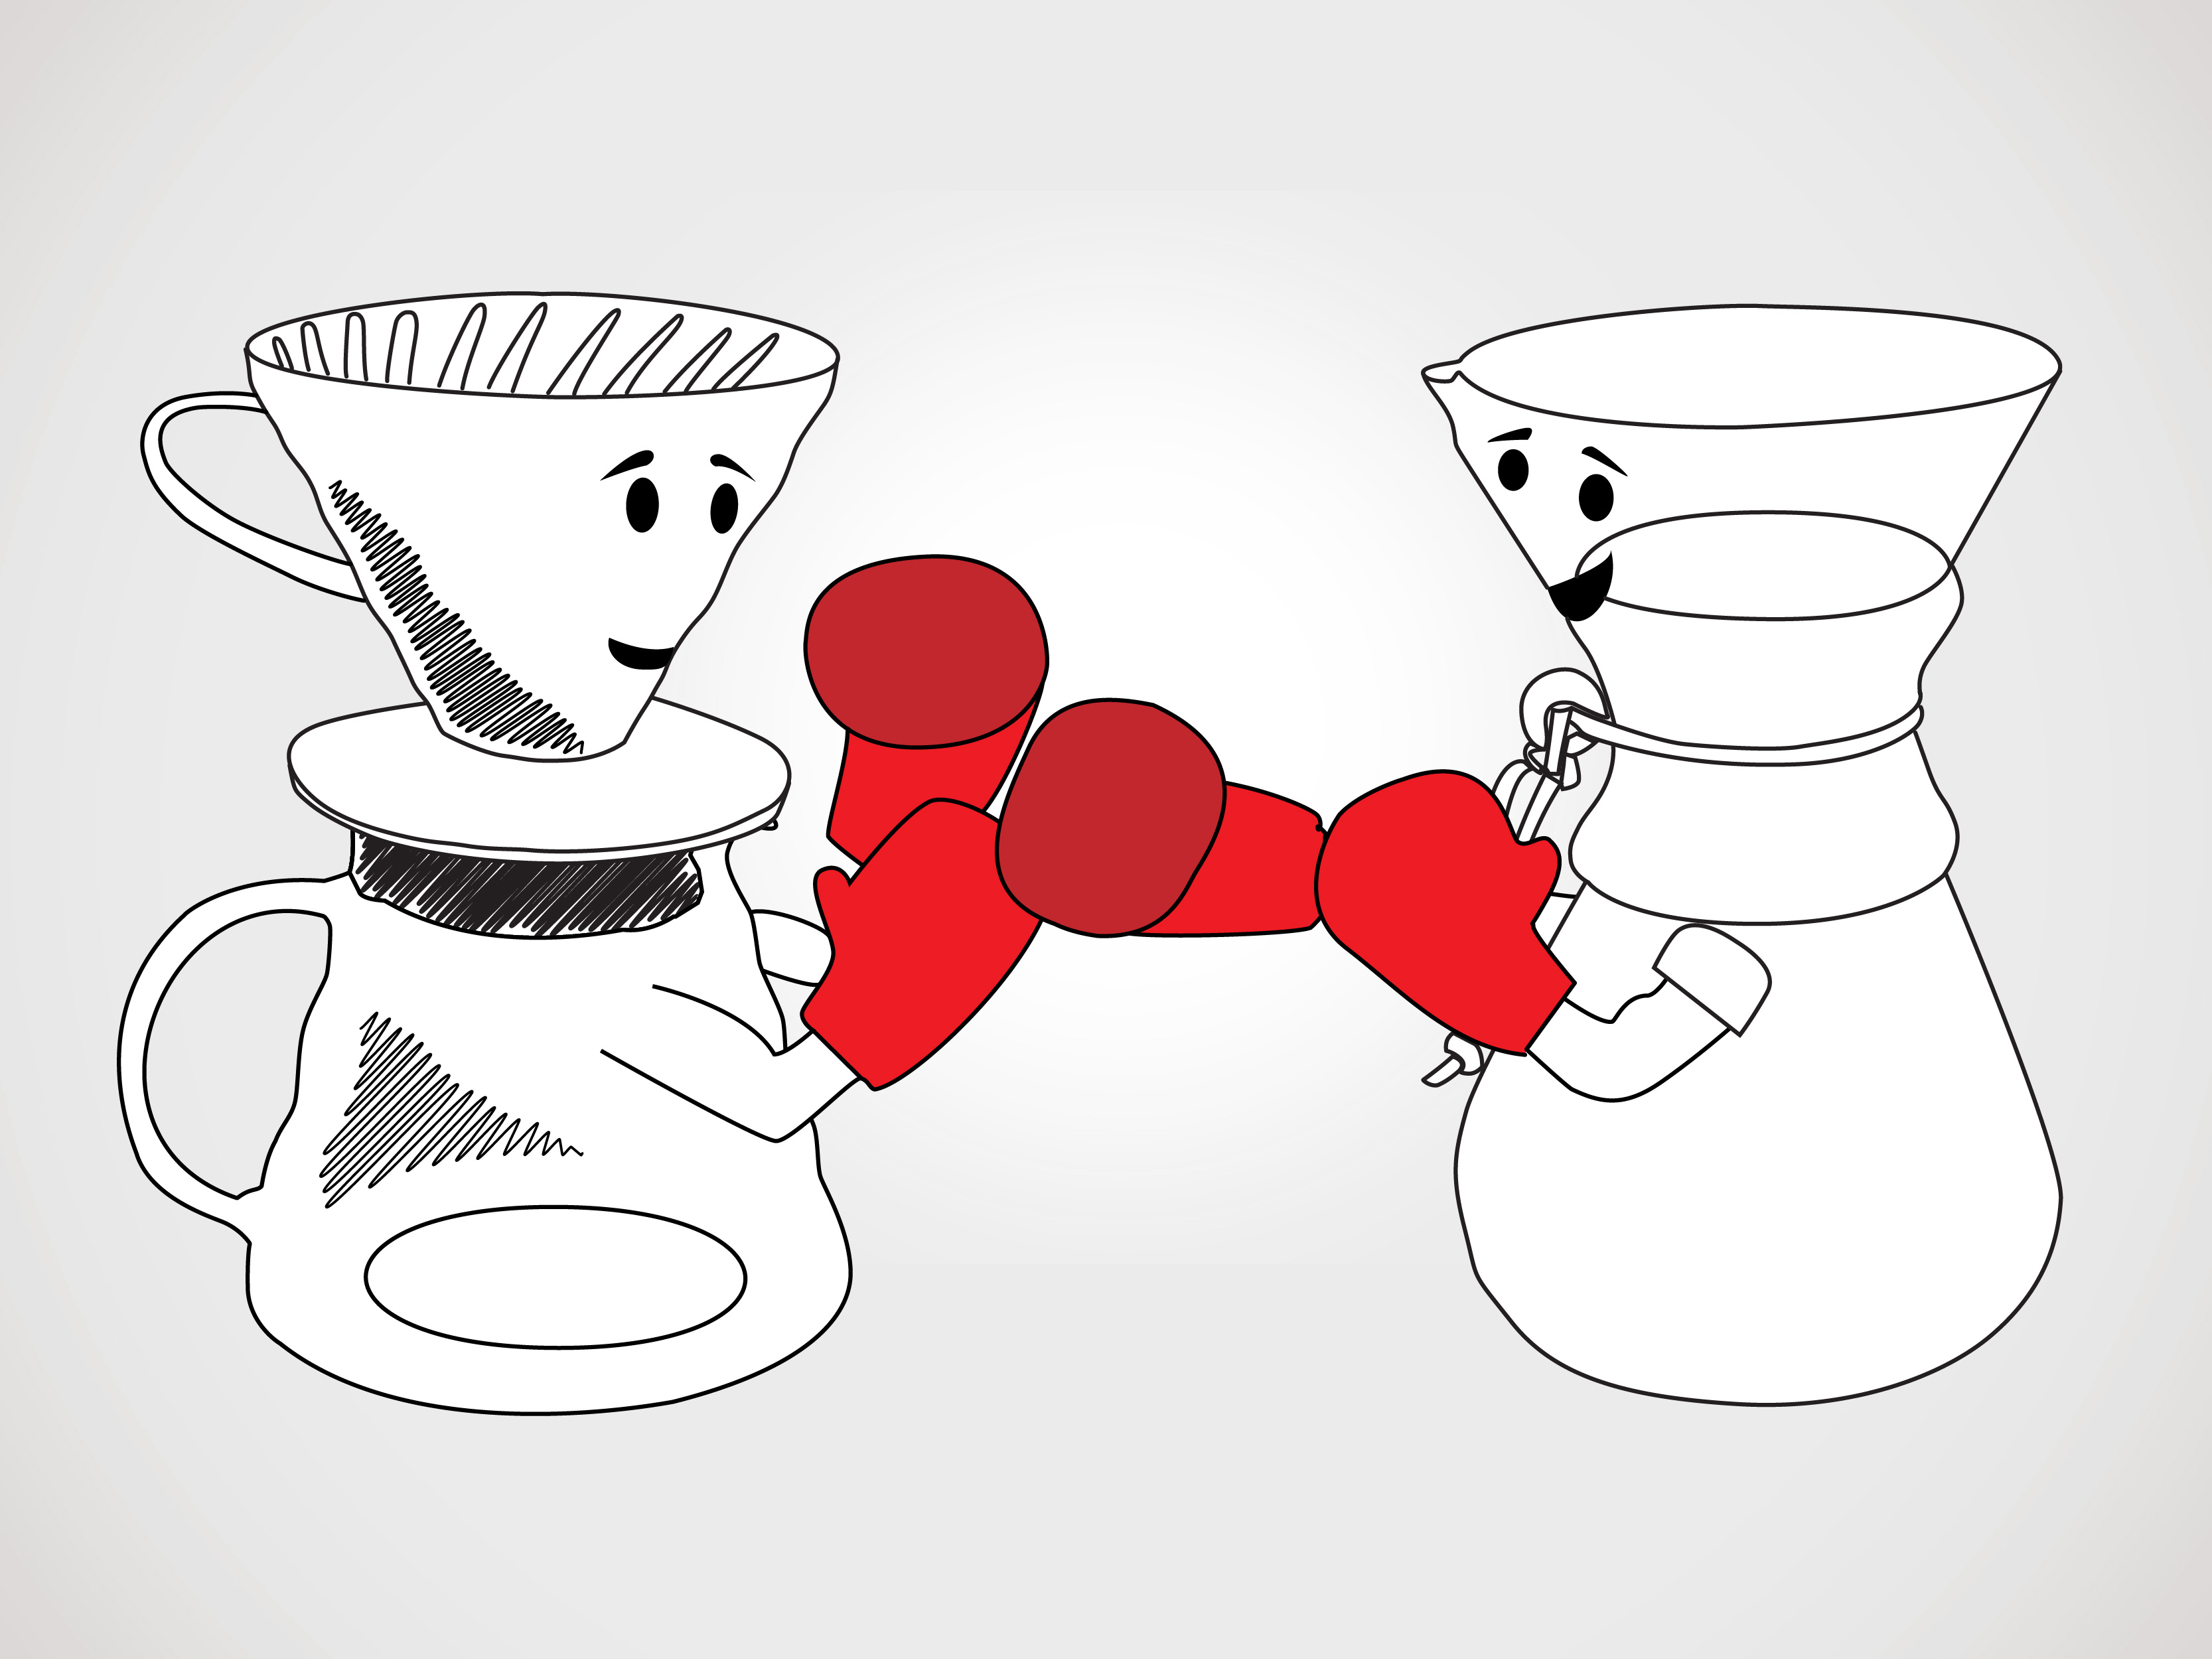 Hario vs. Chemex